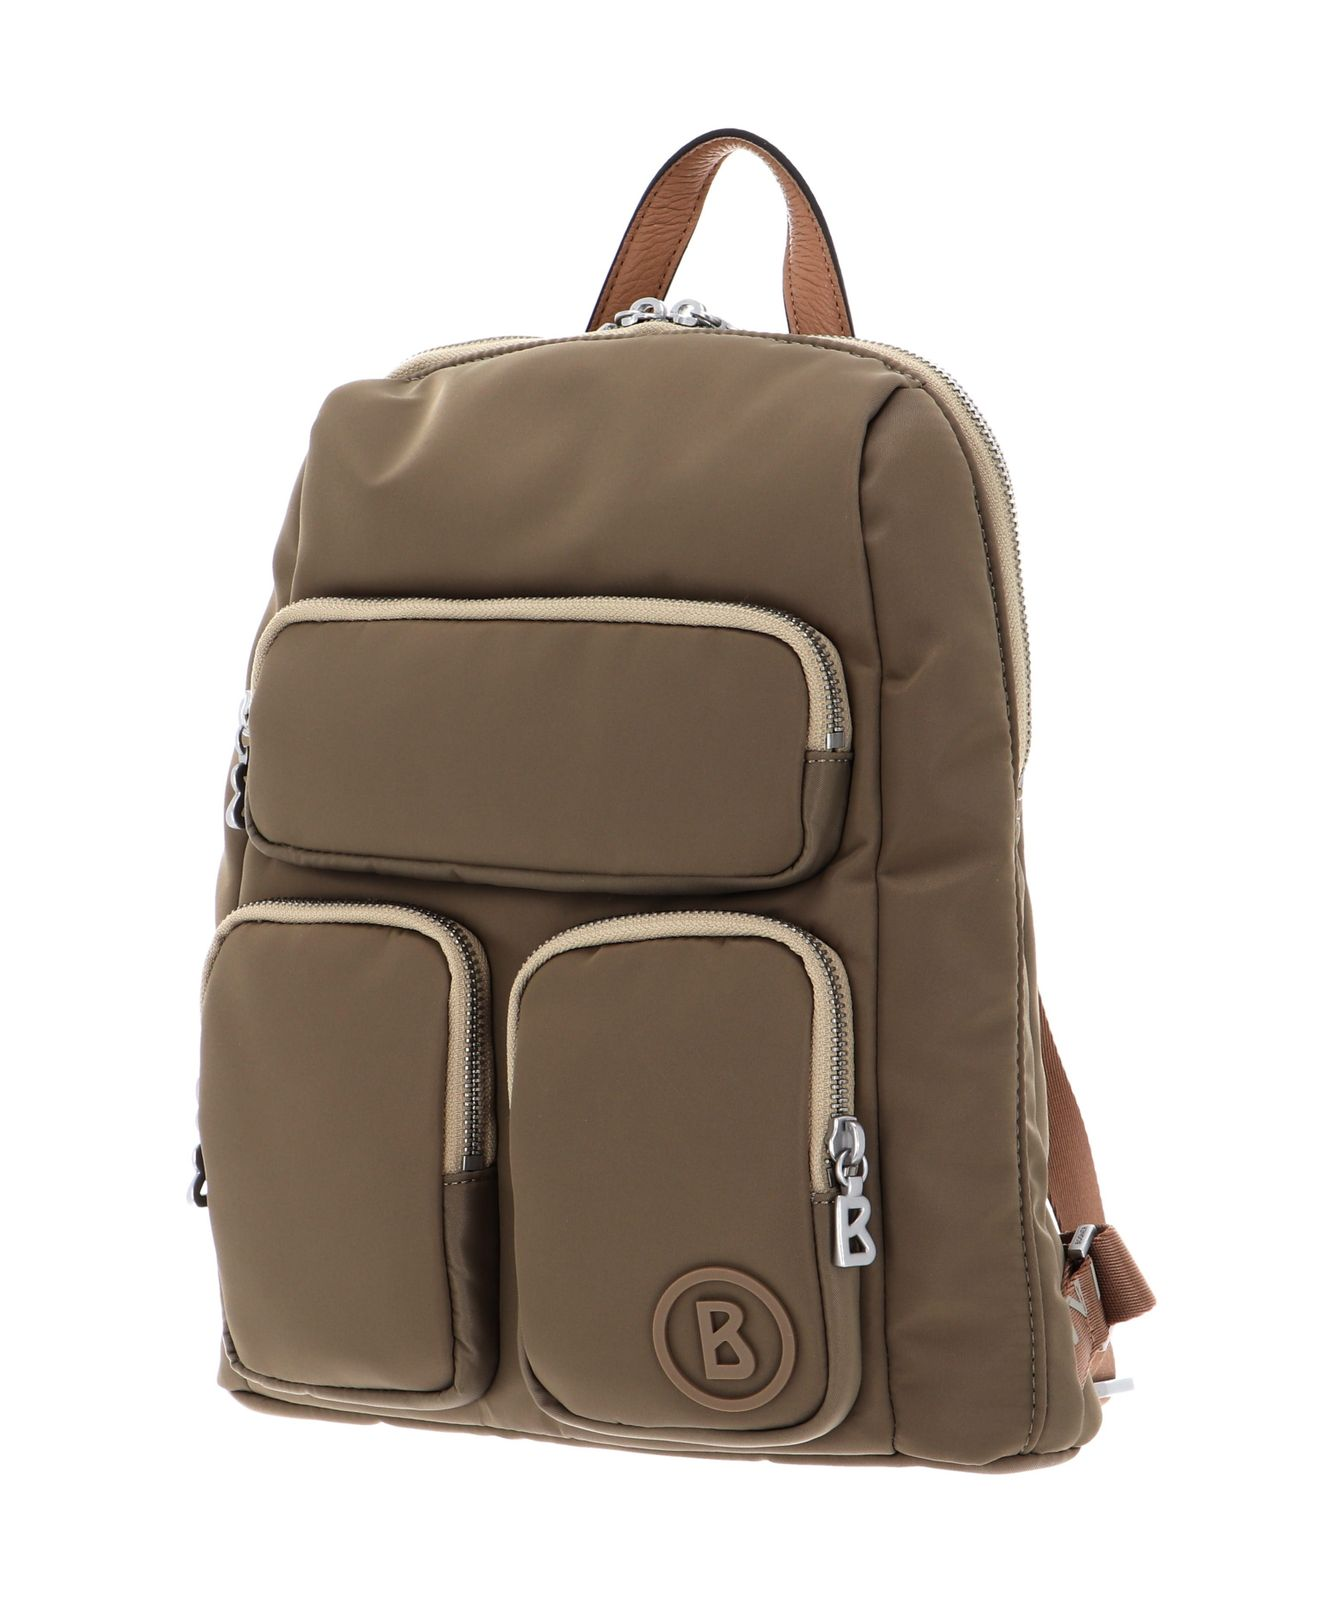 Bogner Fiss Maxi Backpack M Lattemacchiato